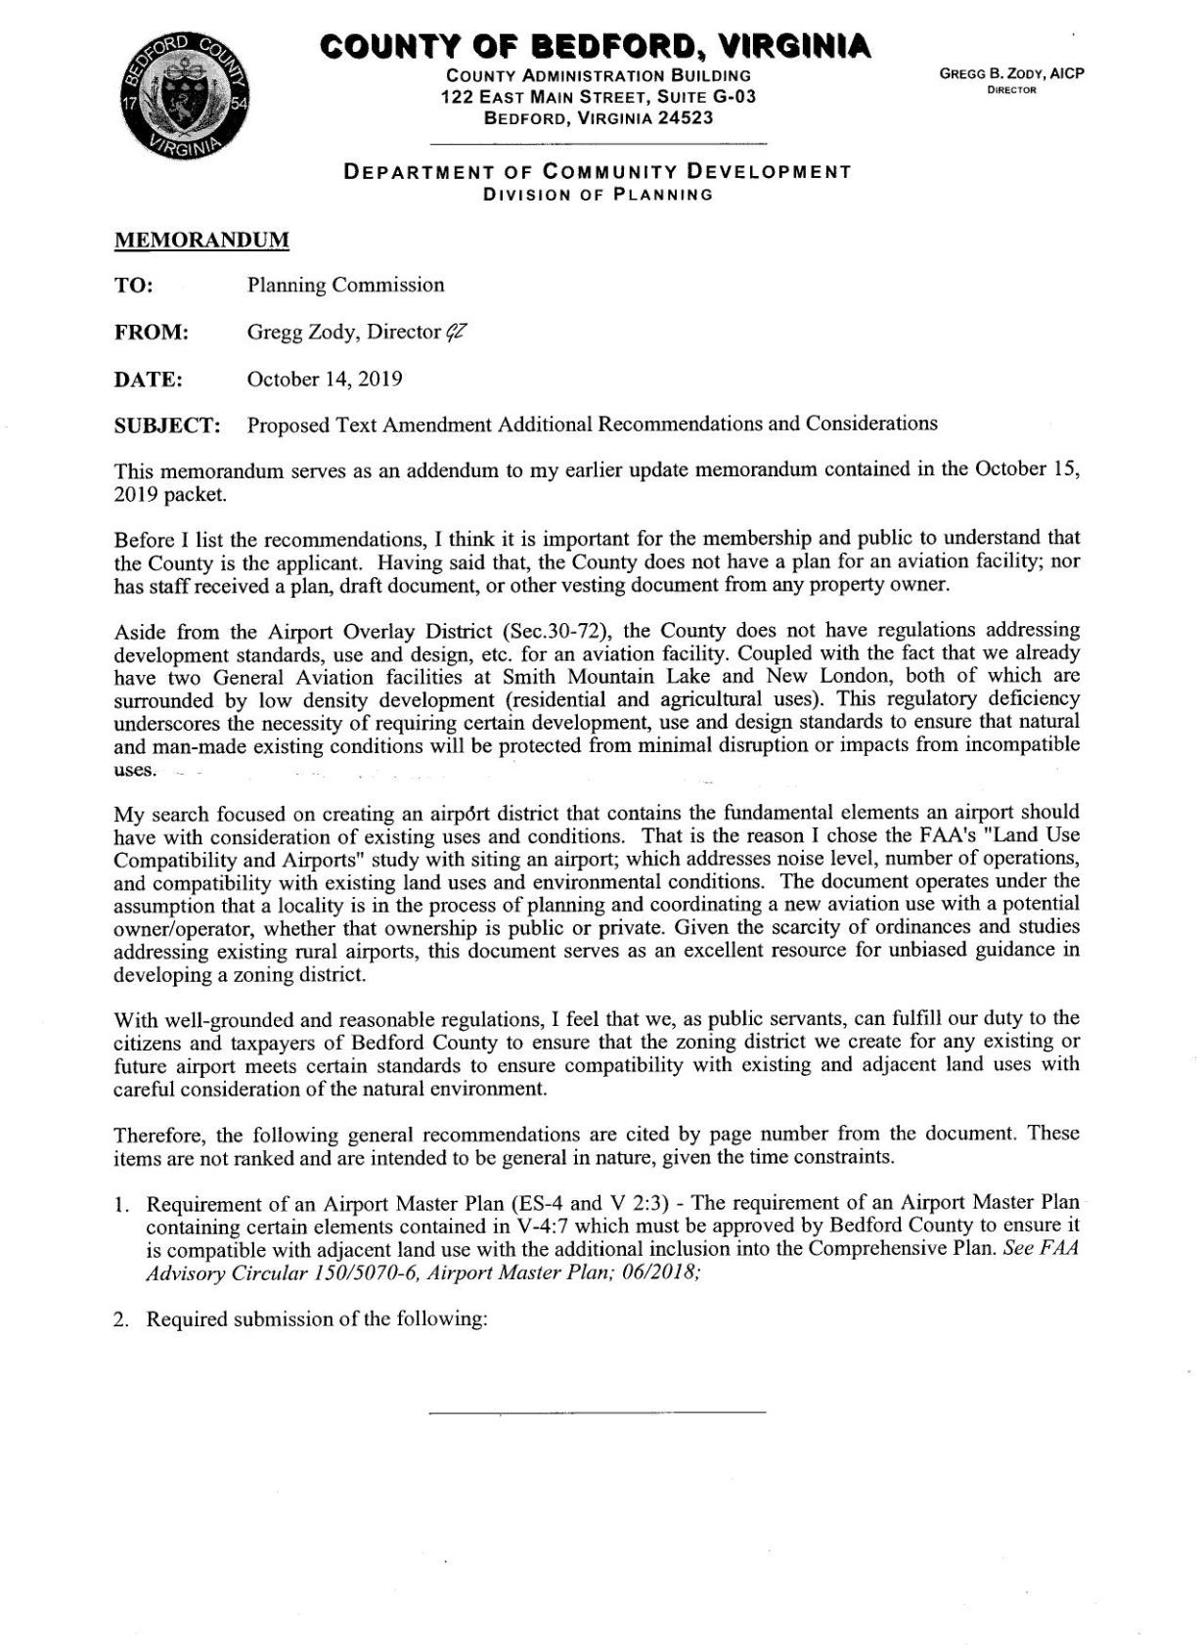 Bedford County Planning Memorandum